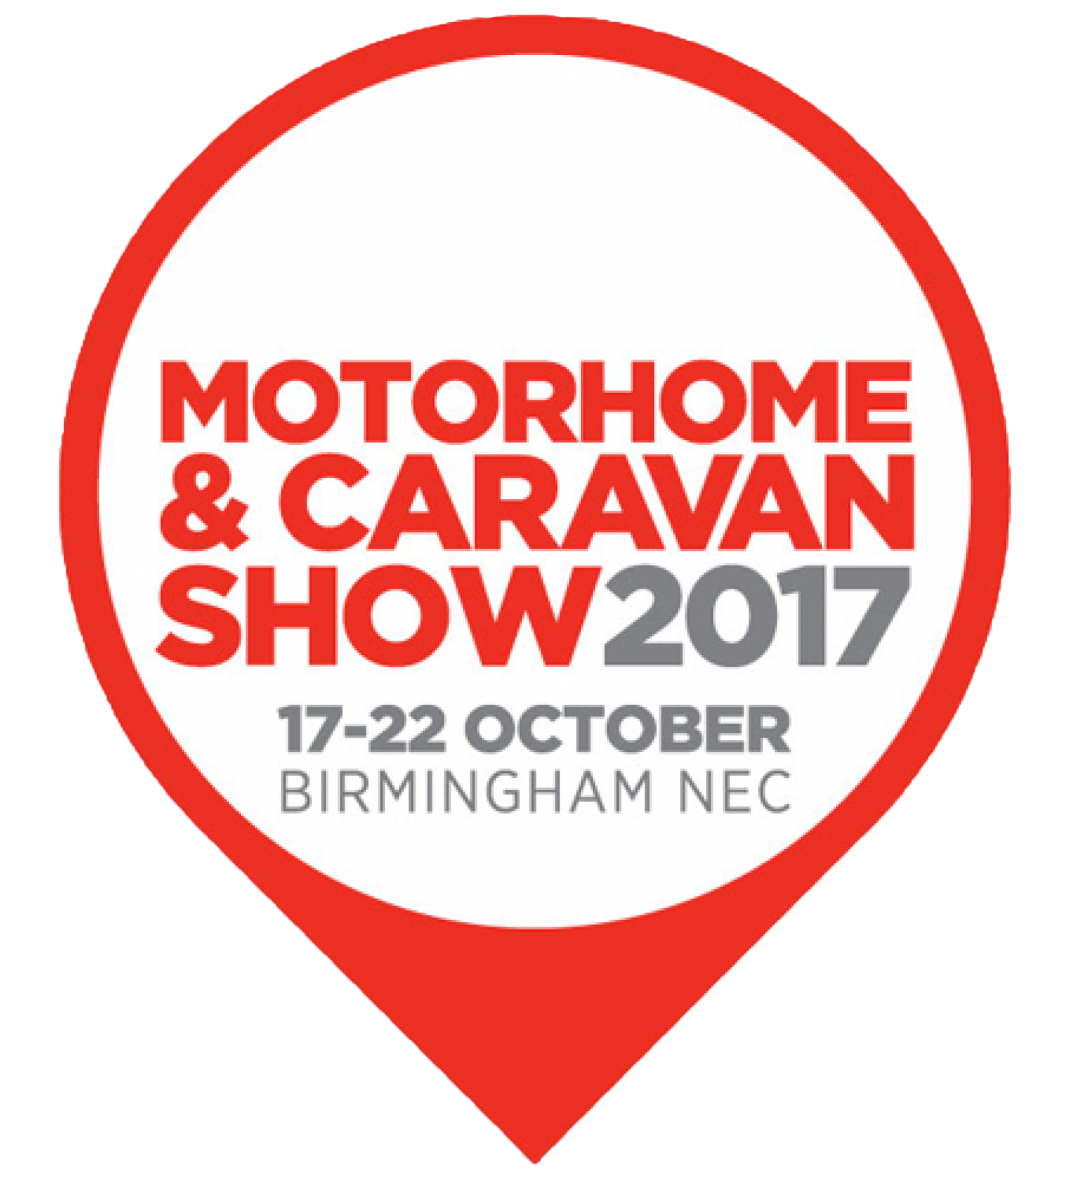 Motorhome & Caravan Show 2017 Image